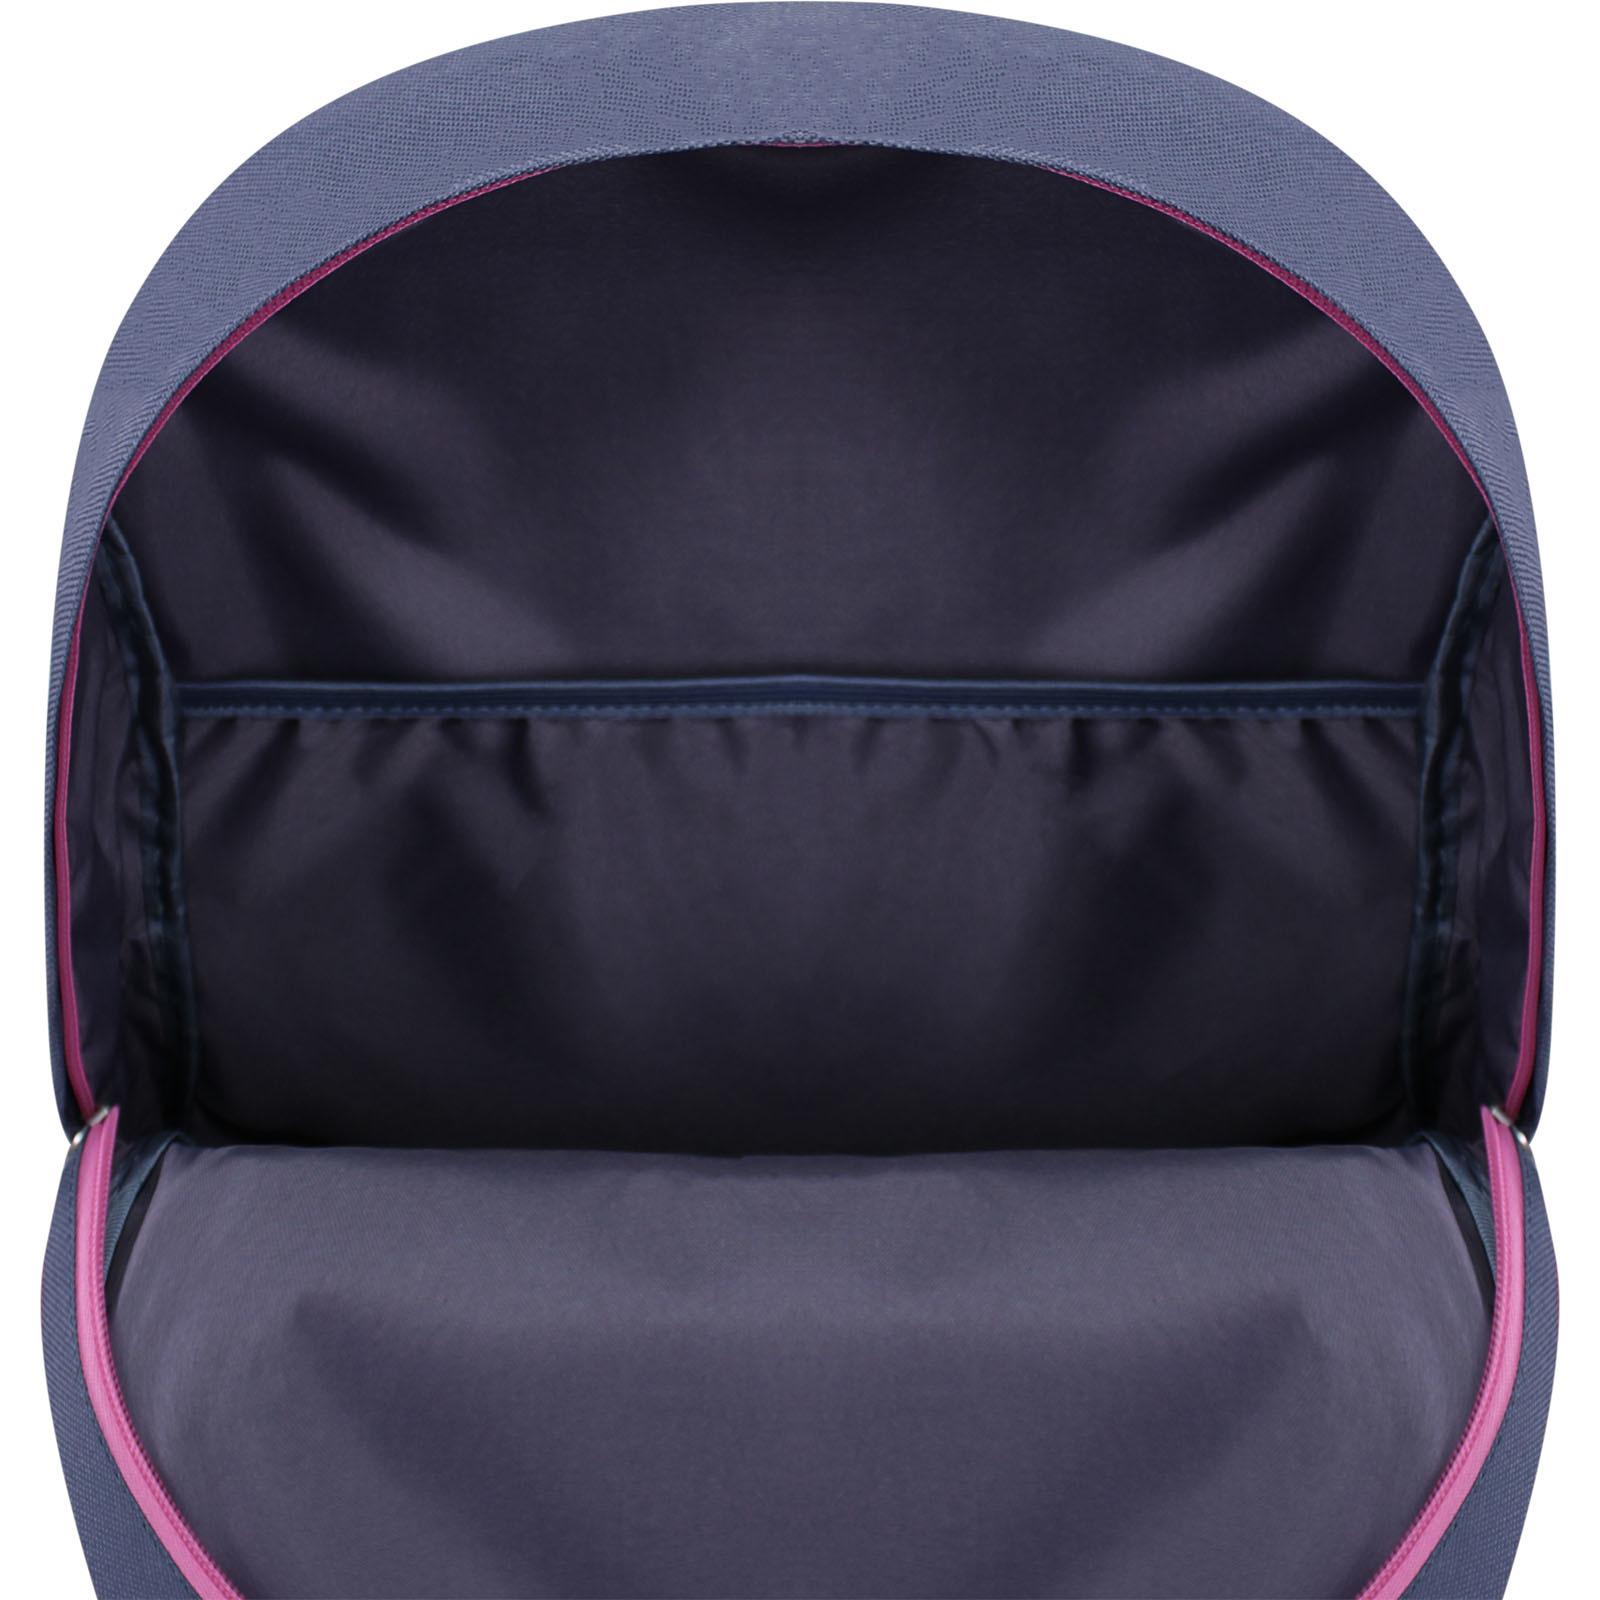 Рюкзак Bagland Молодежный W/R 17 л. Серый/розовый (00533662) фото 5